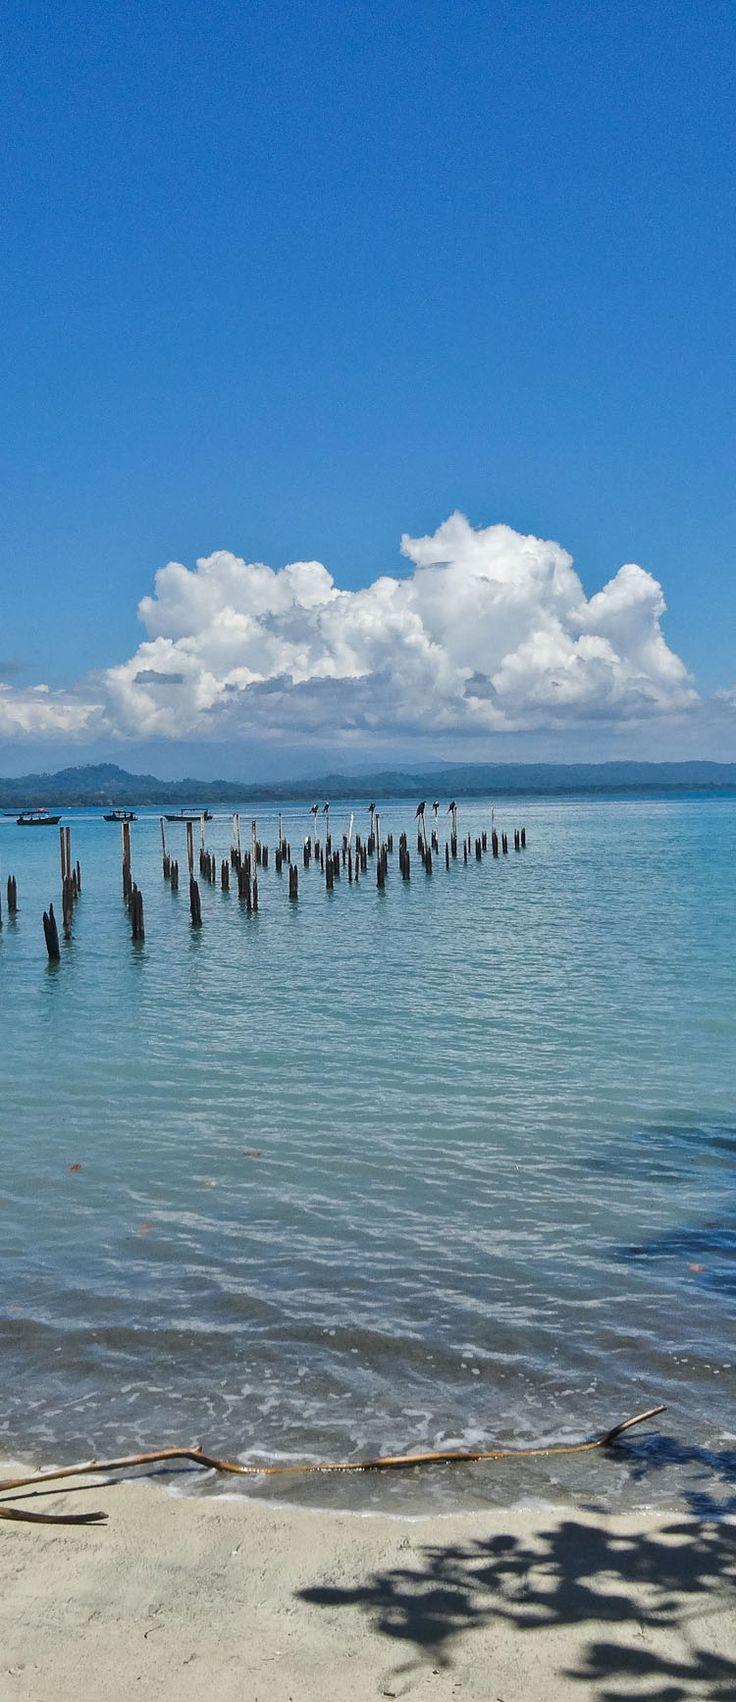 Travel in Central America: Cahuita National Park, Costa Rica